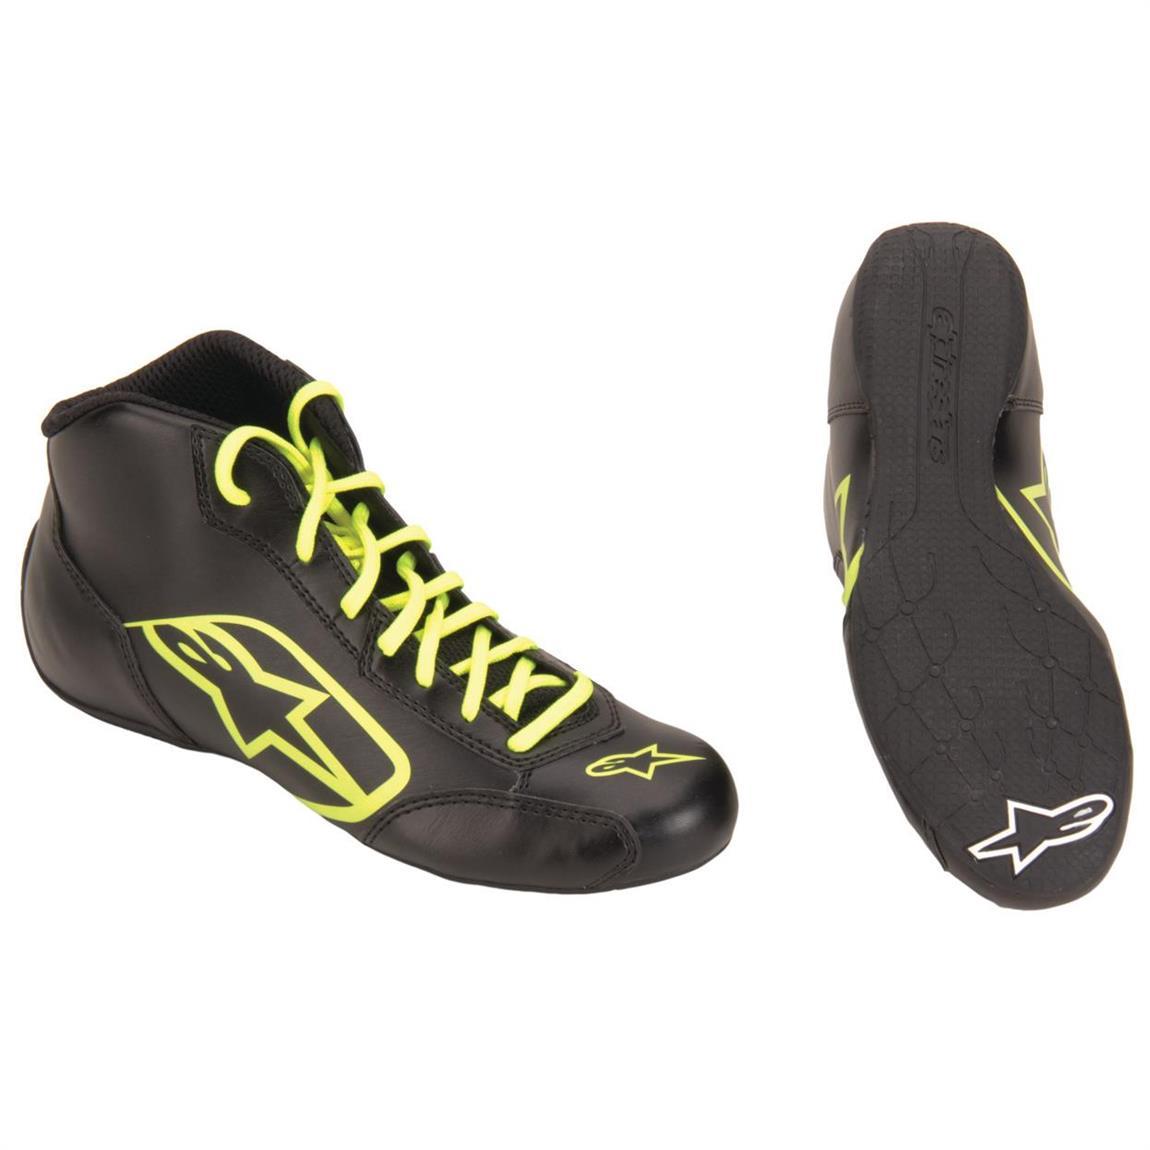 Size 11 Alpinestars 2711518-12B-11 Tech 1-K Start Shoes Black//White